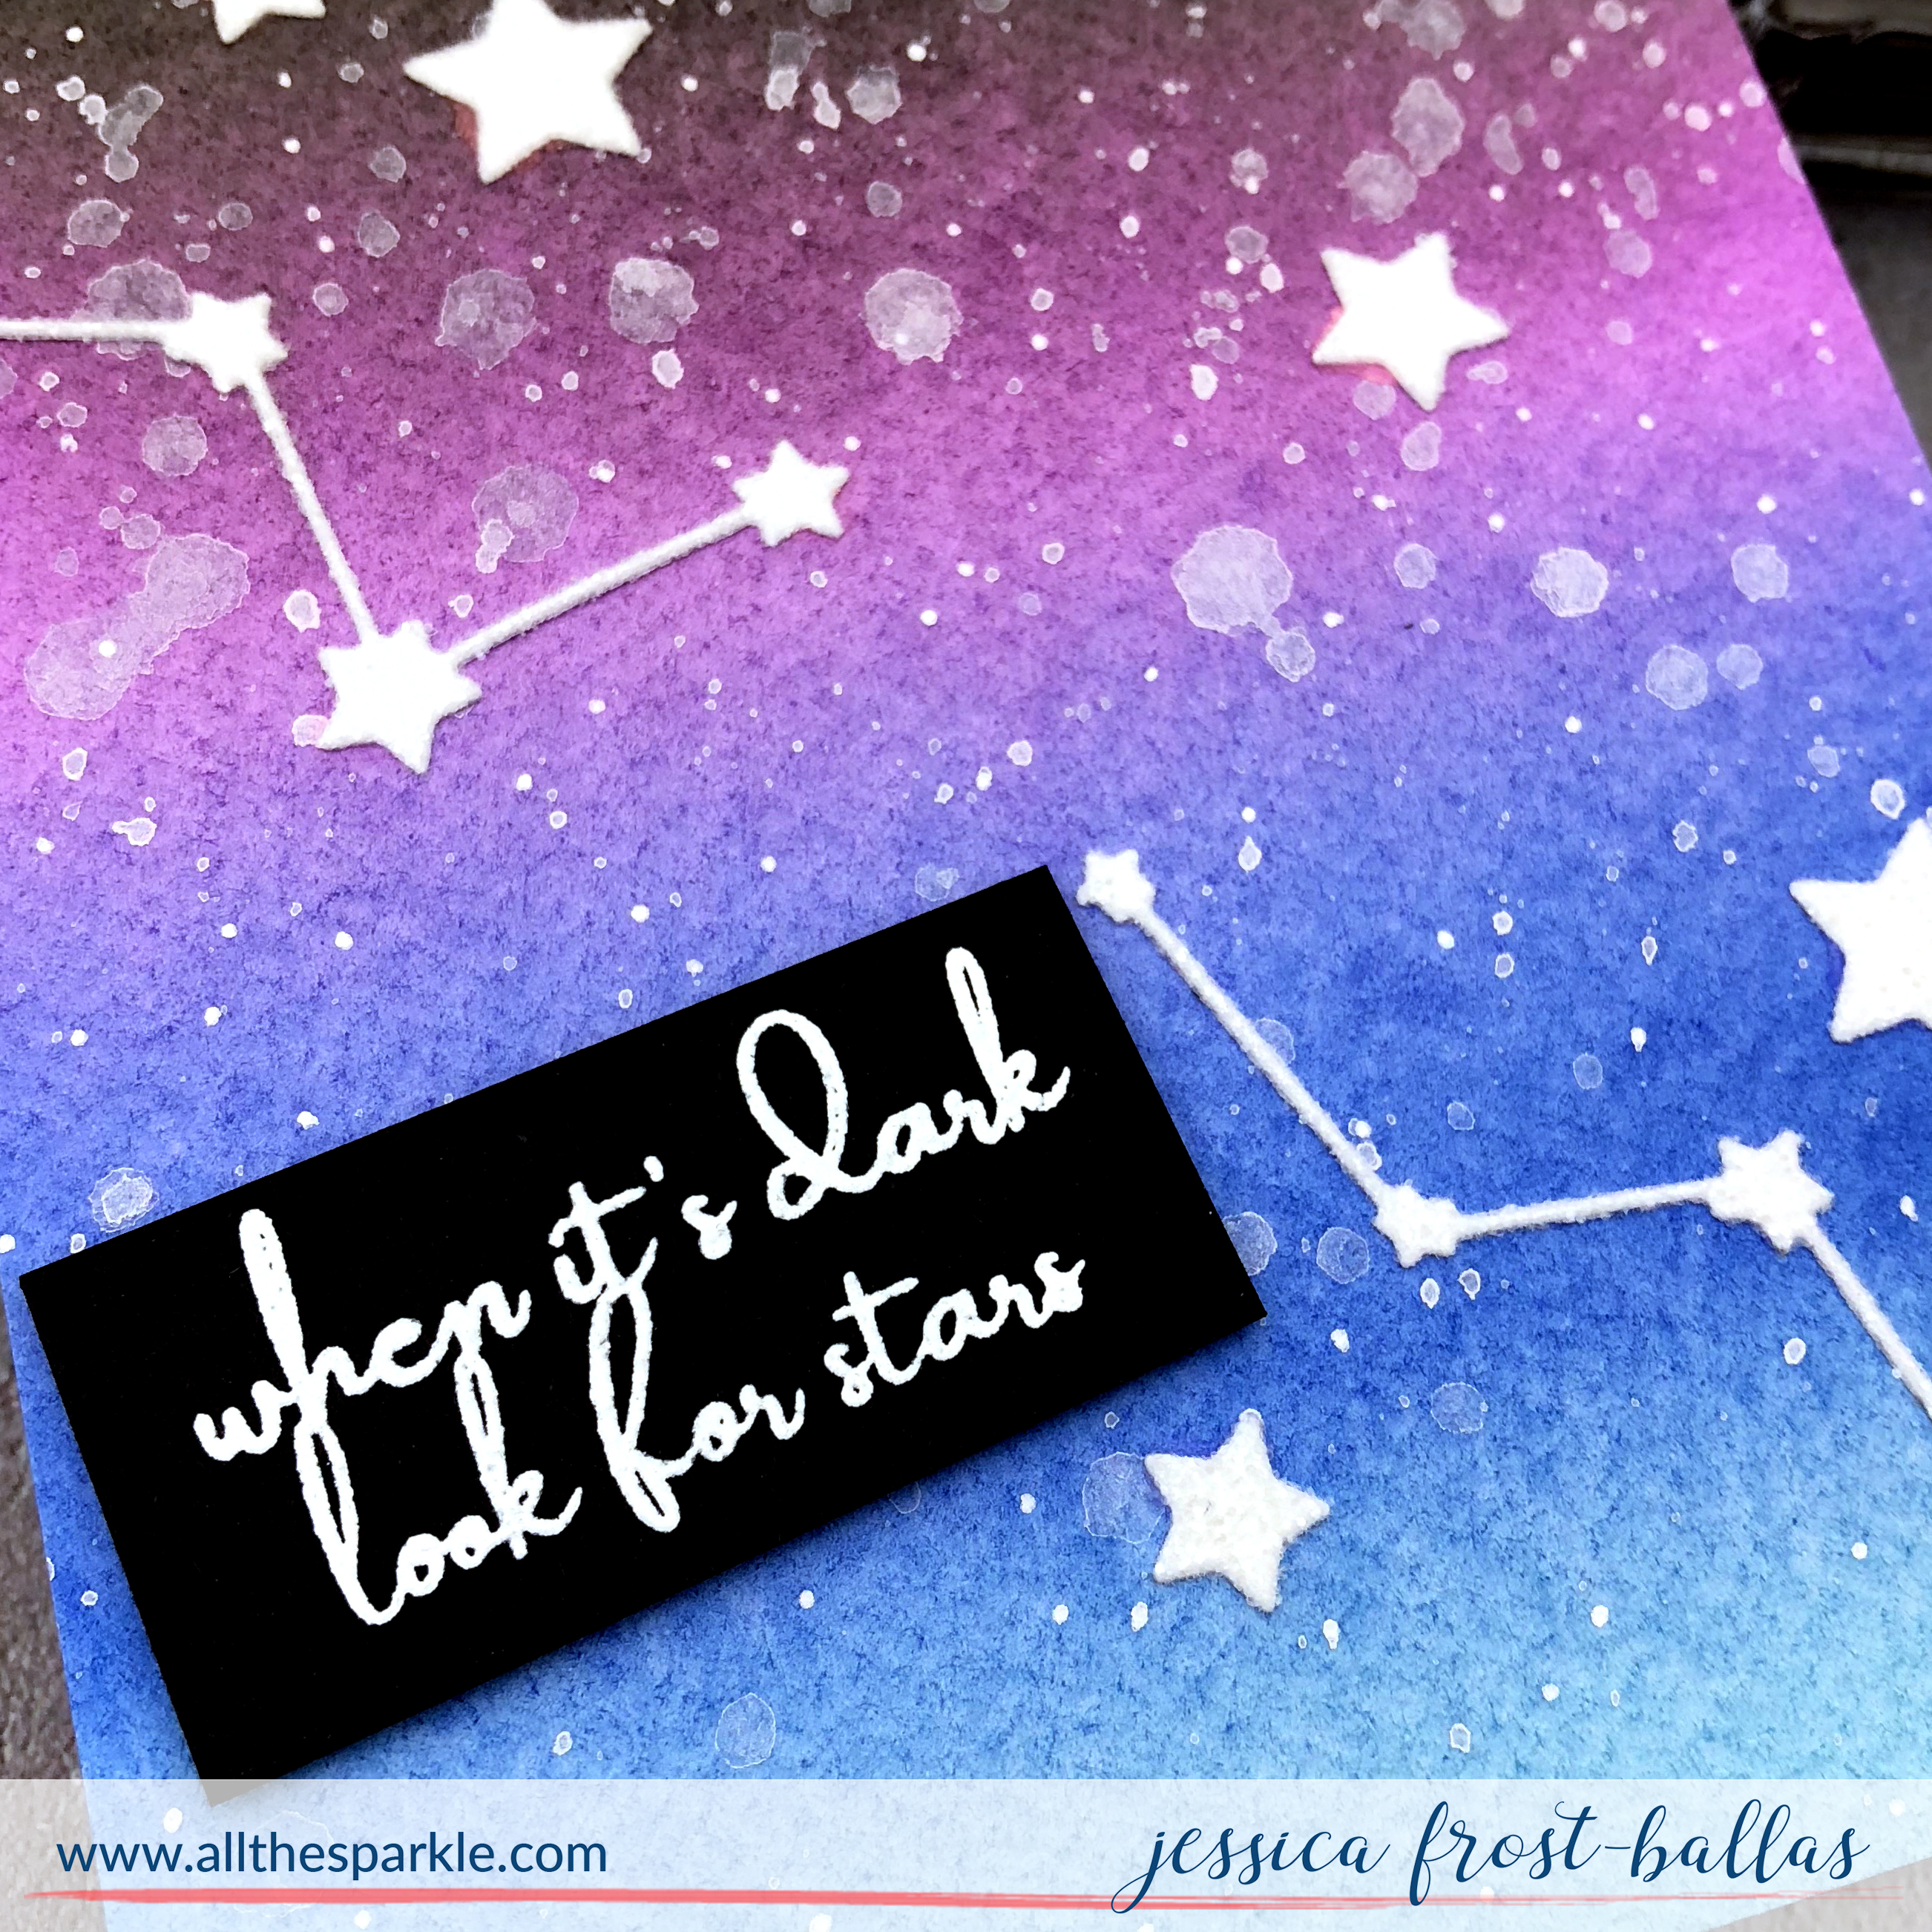 When It's Dark Look for Stars by Jessica Frost-Ballas for Pinkfresh Studio